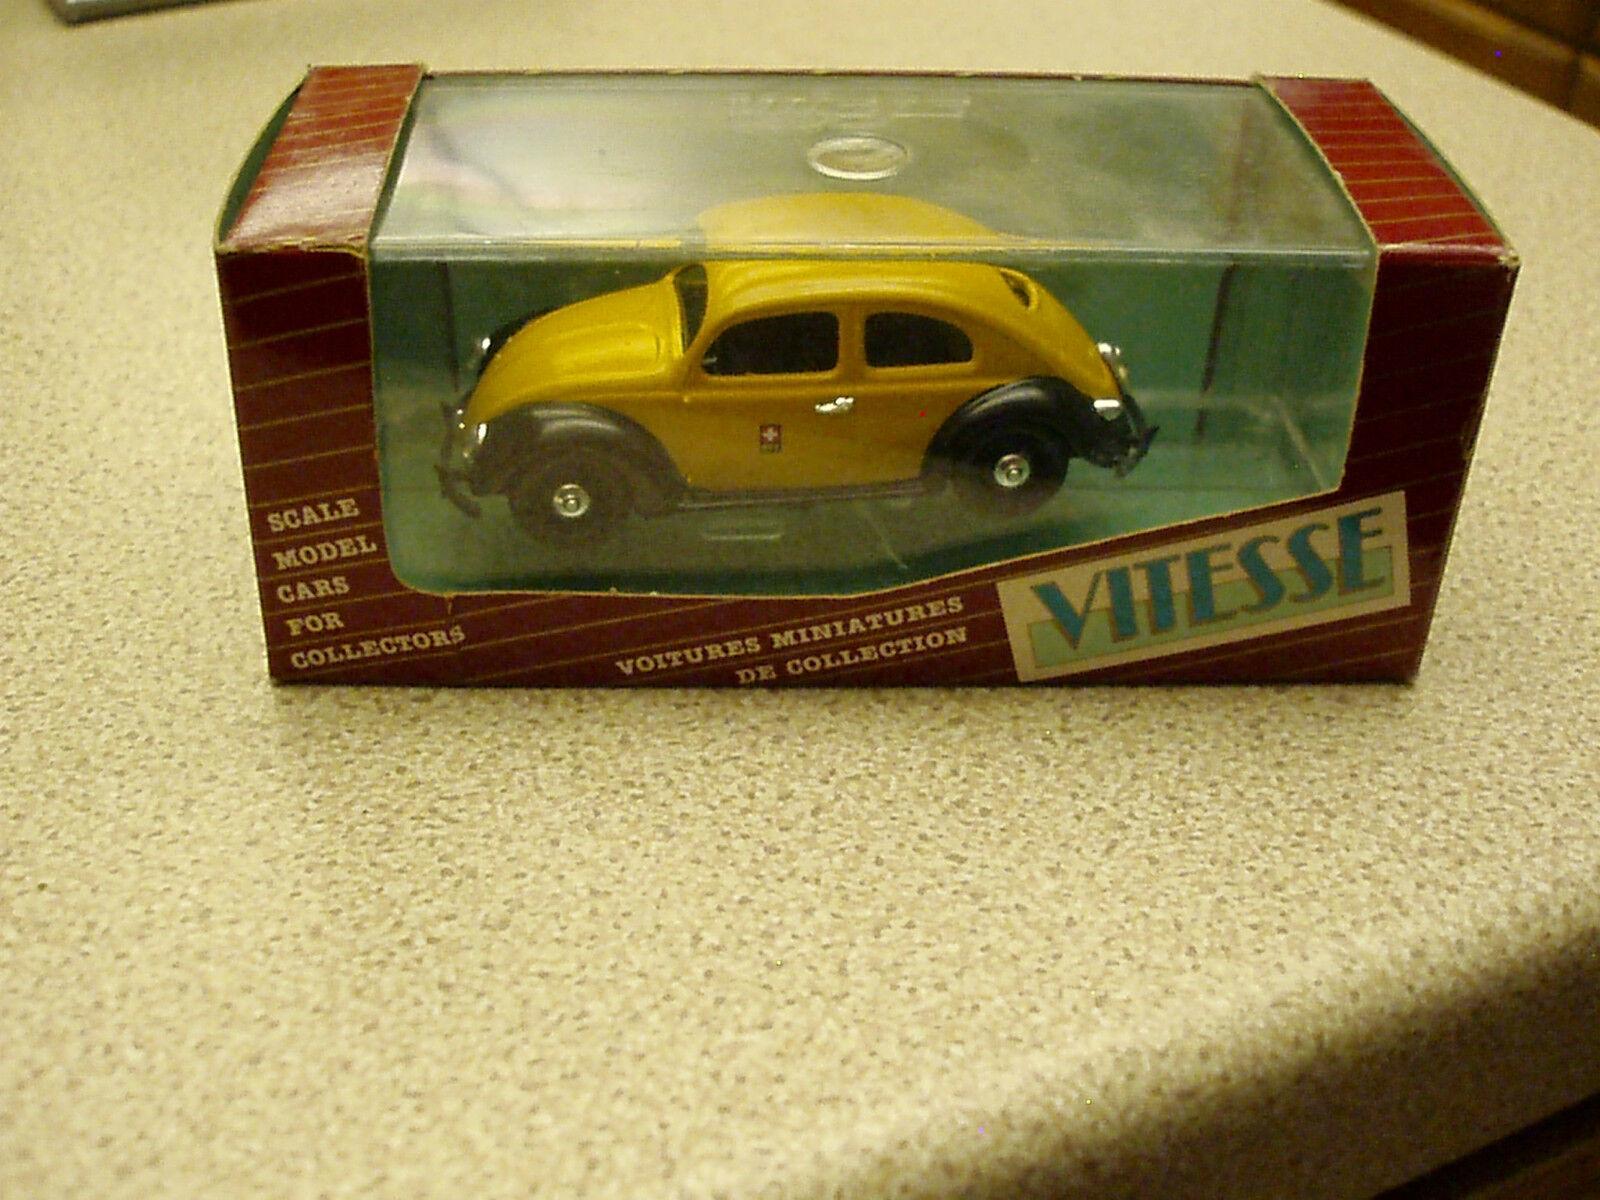 Vitesse  408.1 volkswagen 1949 Sedan  Postes Suisses  Untouched